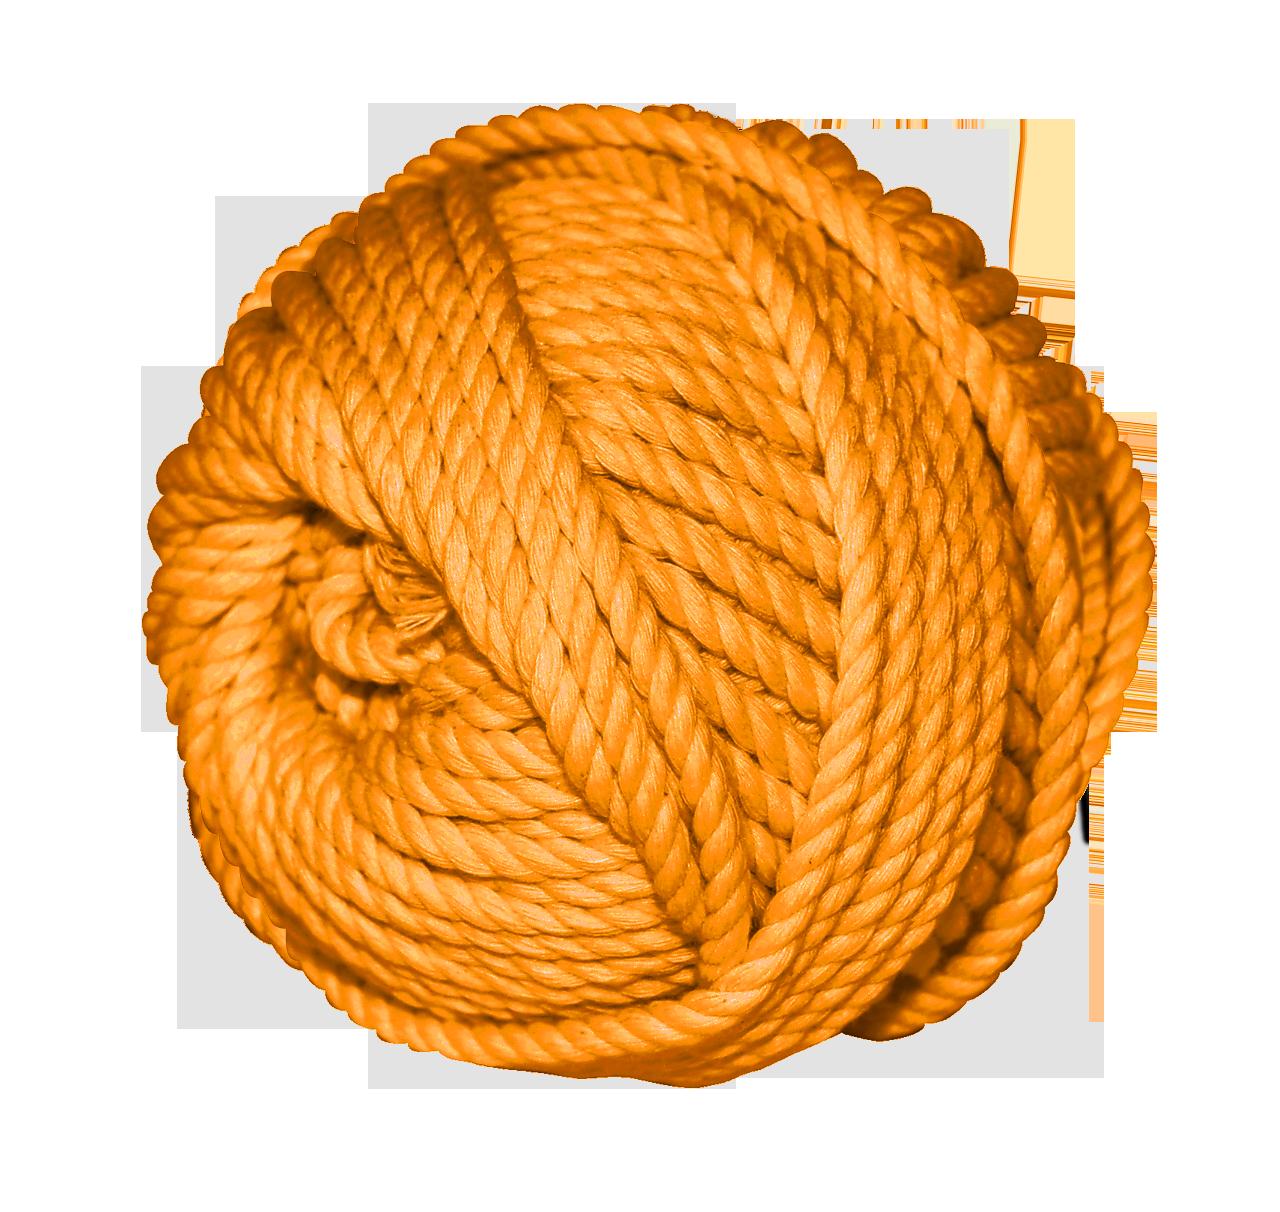 yarn clip art